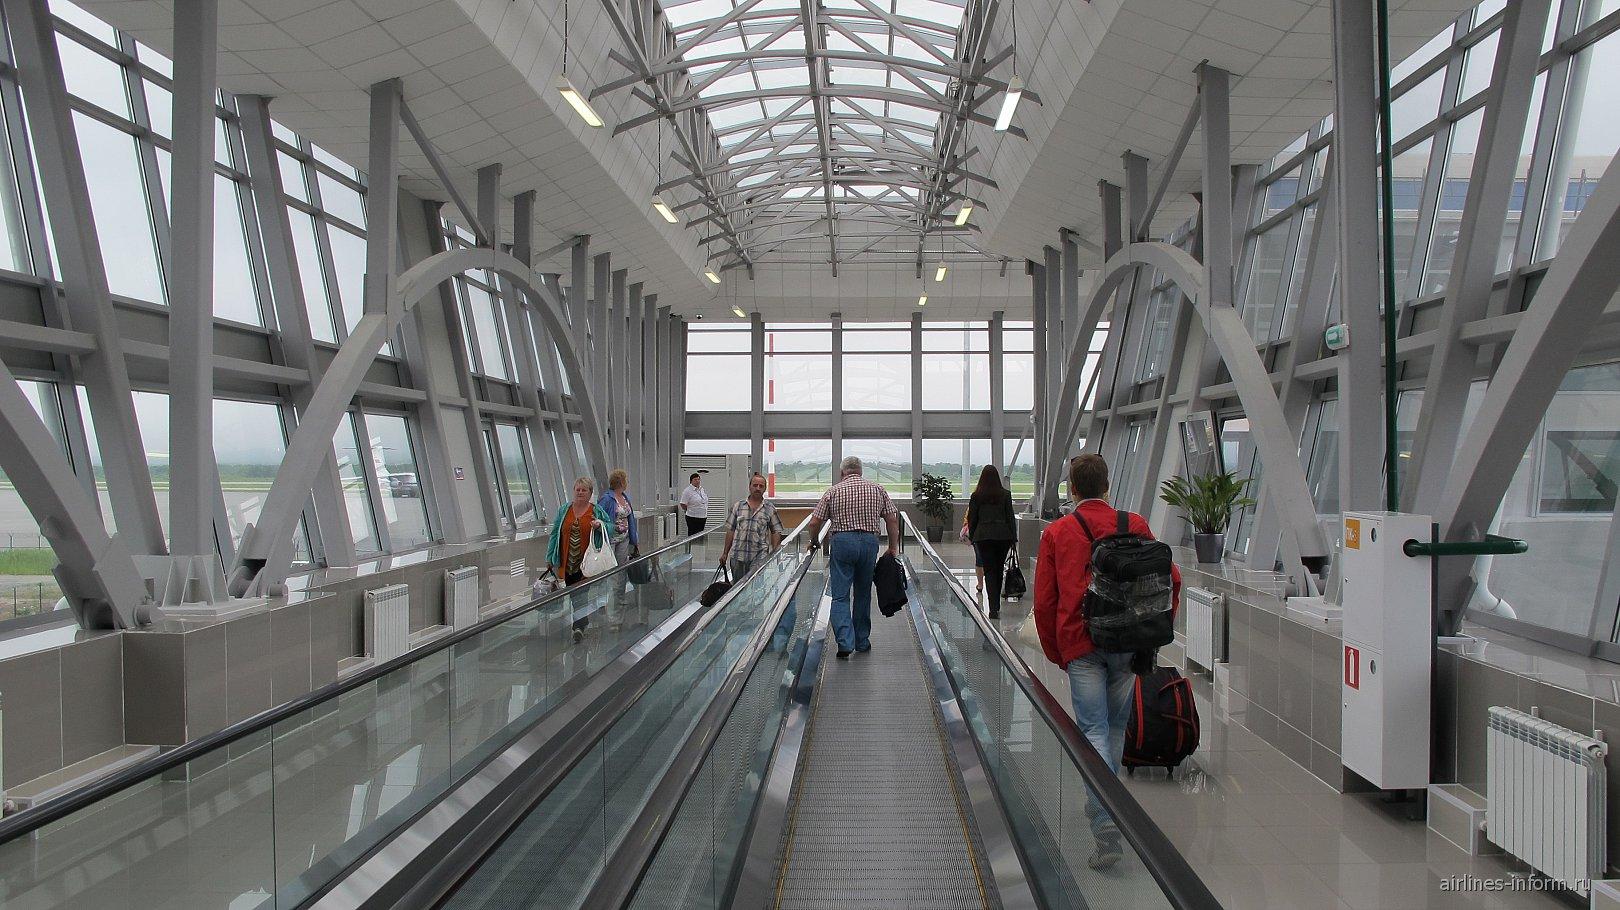 Аэроэкспресс в аэропорт Владивостока